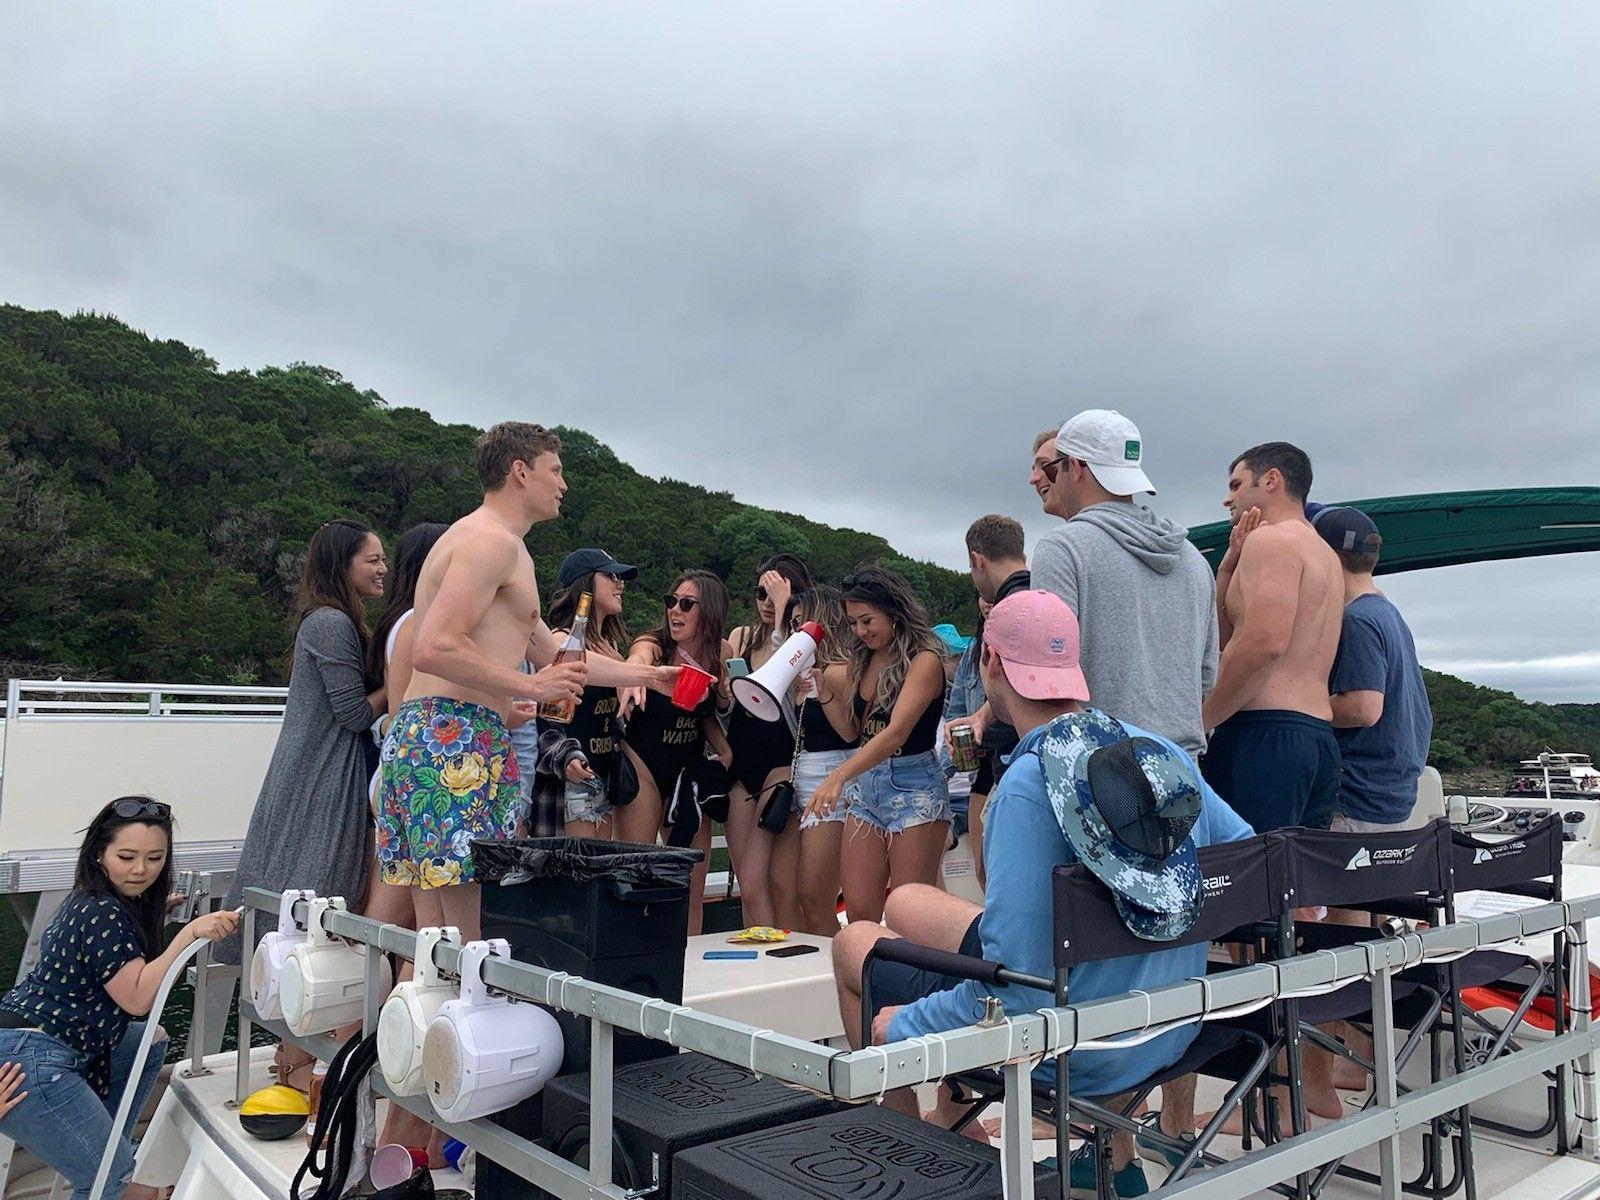 Bachelorette bachelor party image by lake travis yacht